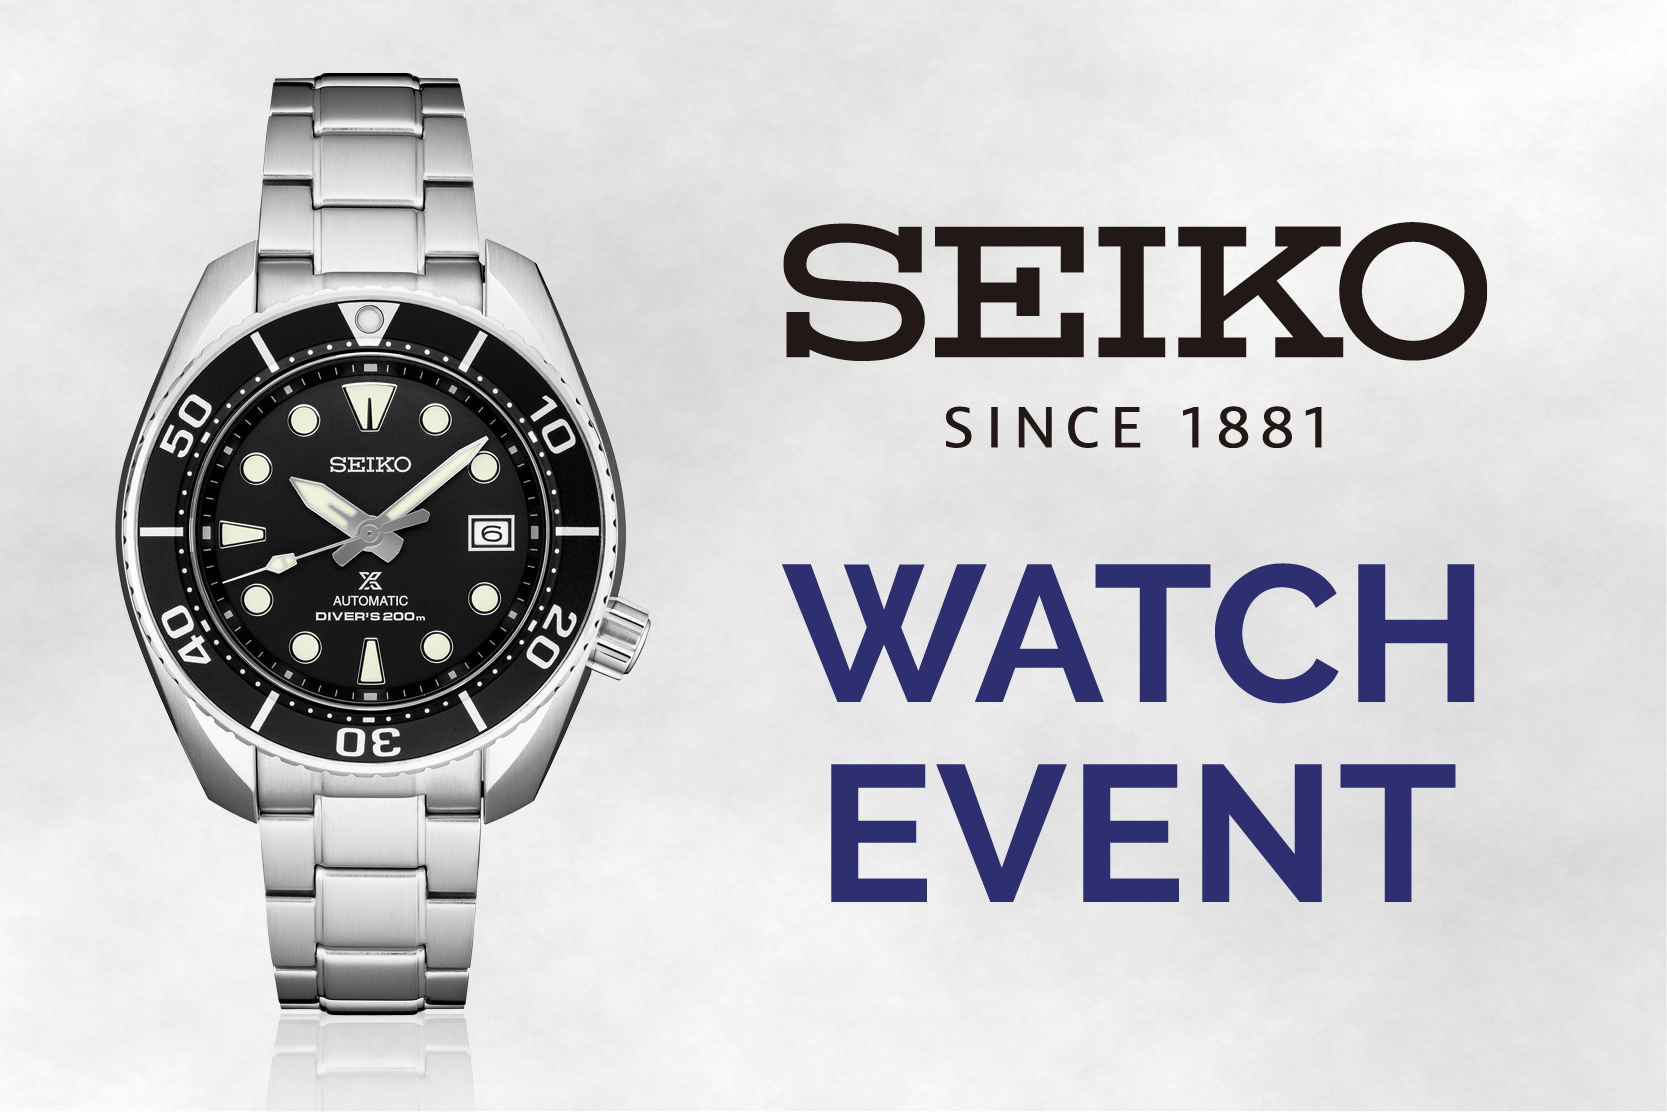 Seiko Watch & Scotch Event